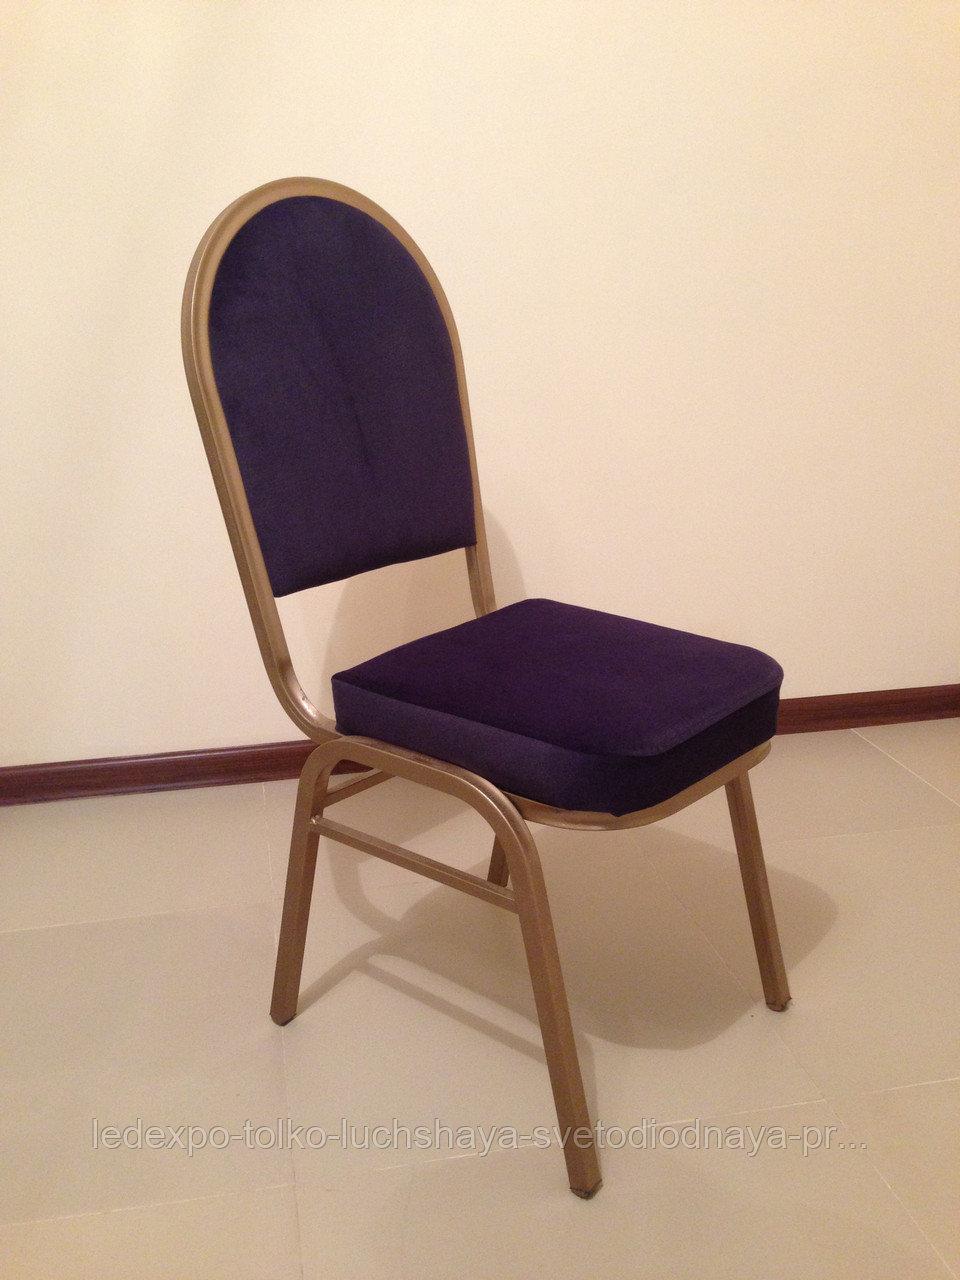 Металлический банкетный стул - Эрэс